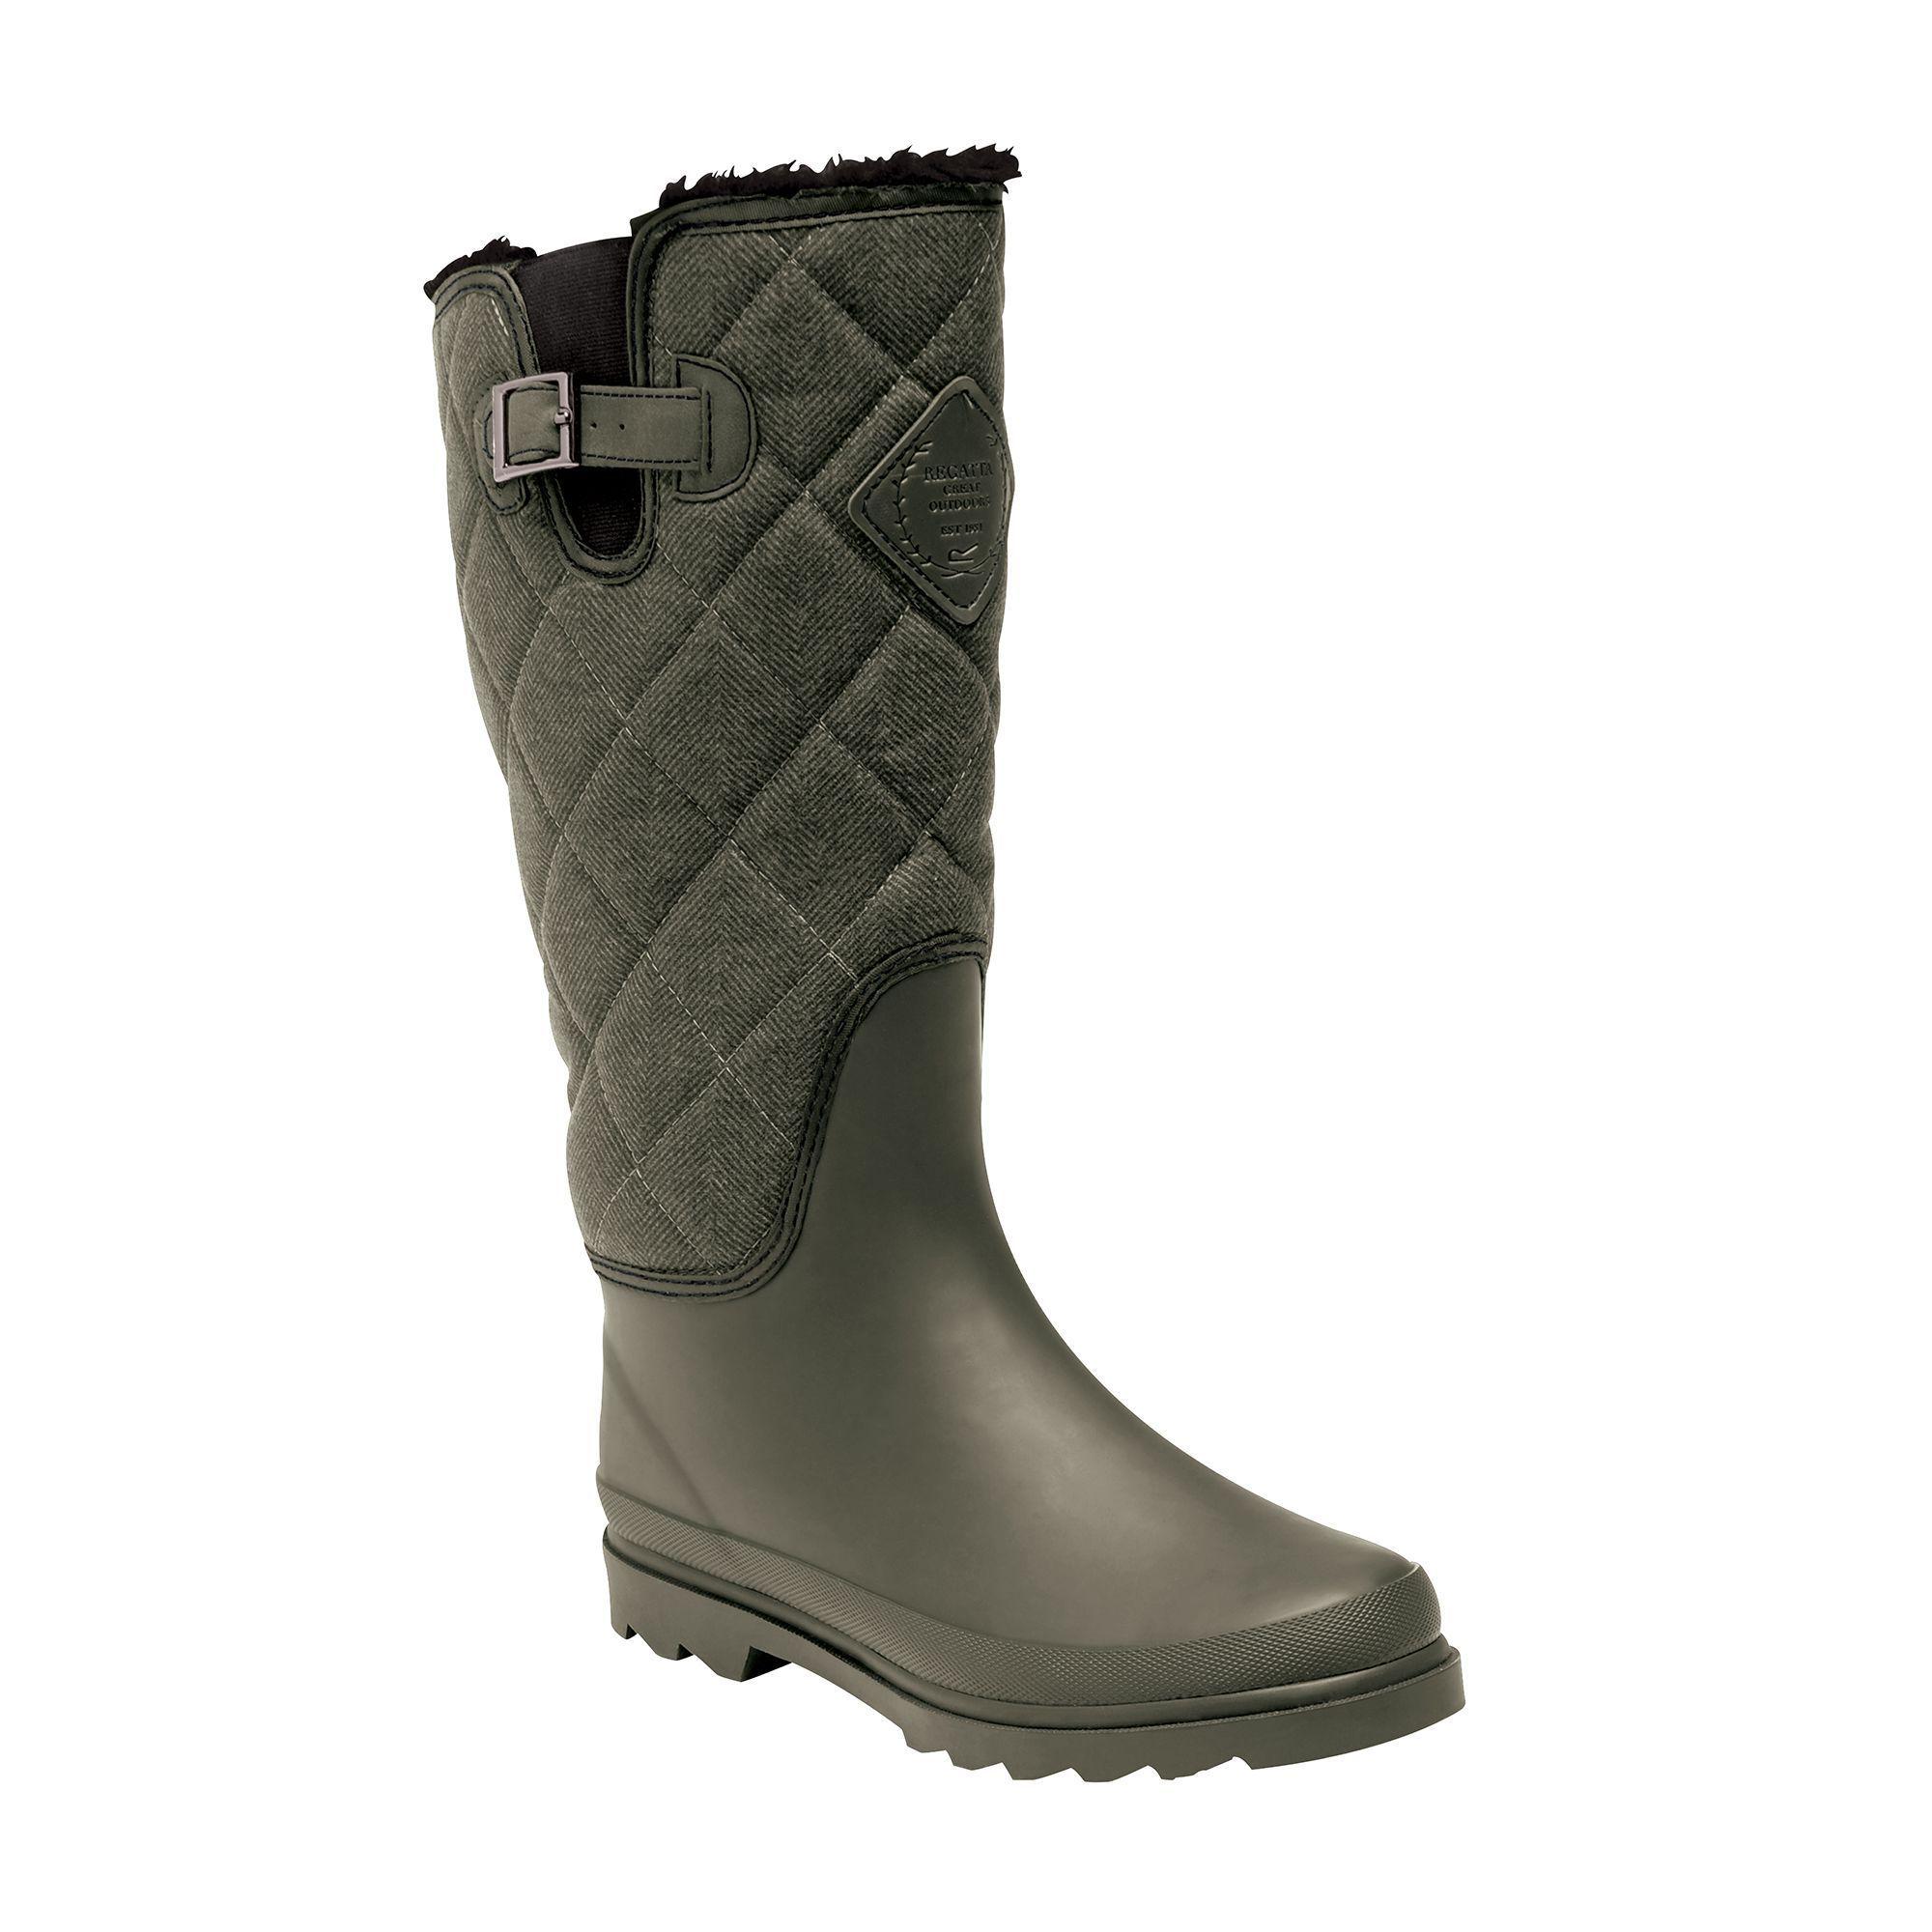 Regatta Womens/Ladies Fleetwood Casual Wellington Boots